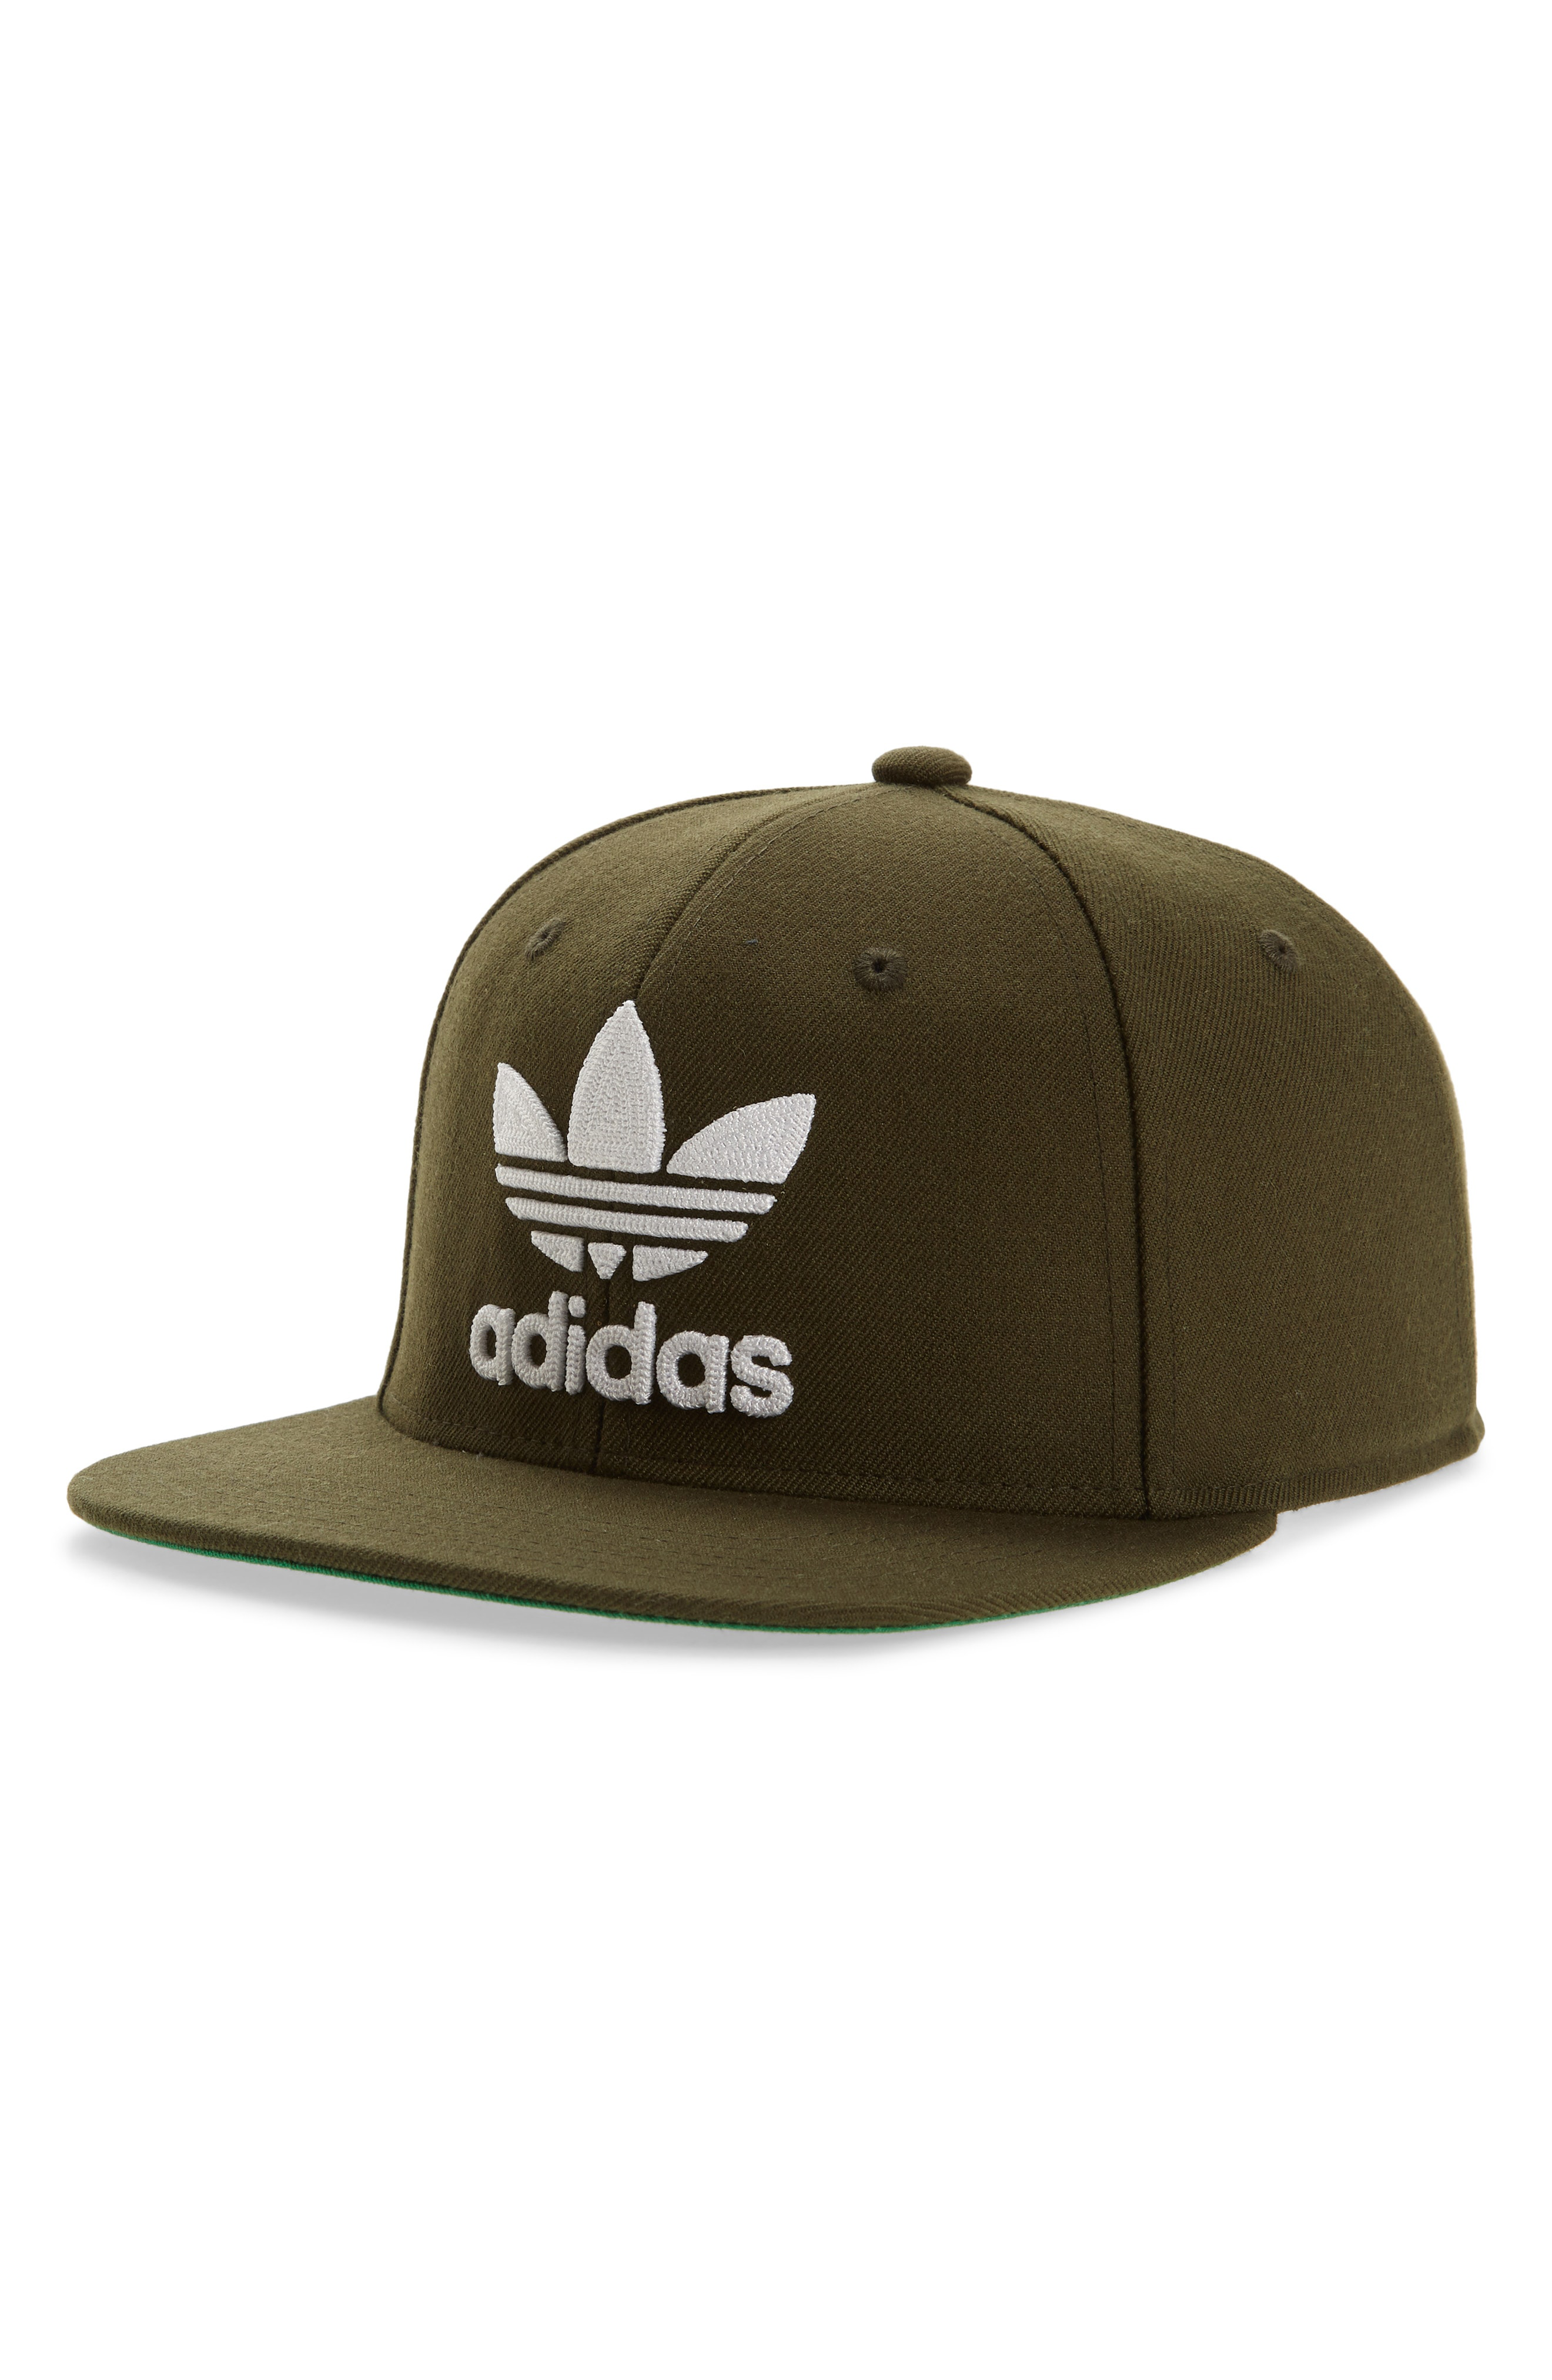 538552bde8c Adidas Originals Trefoil Chain Snapback Baseball Cap In Cargo  White ...